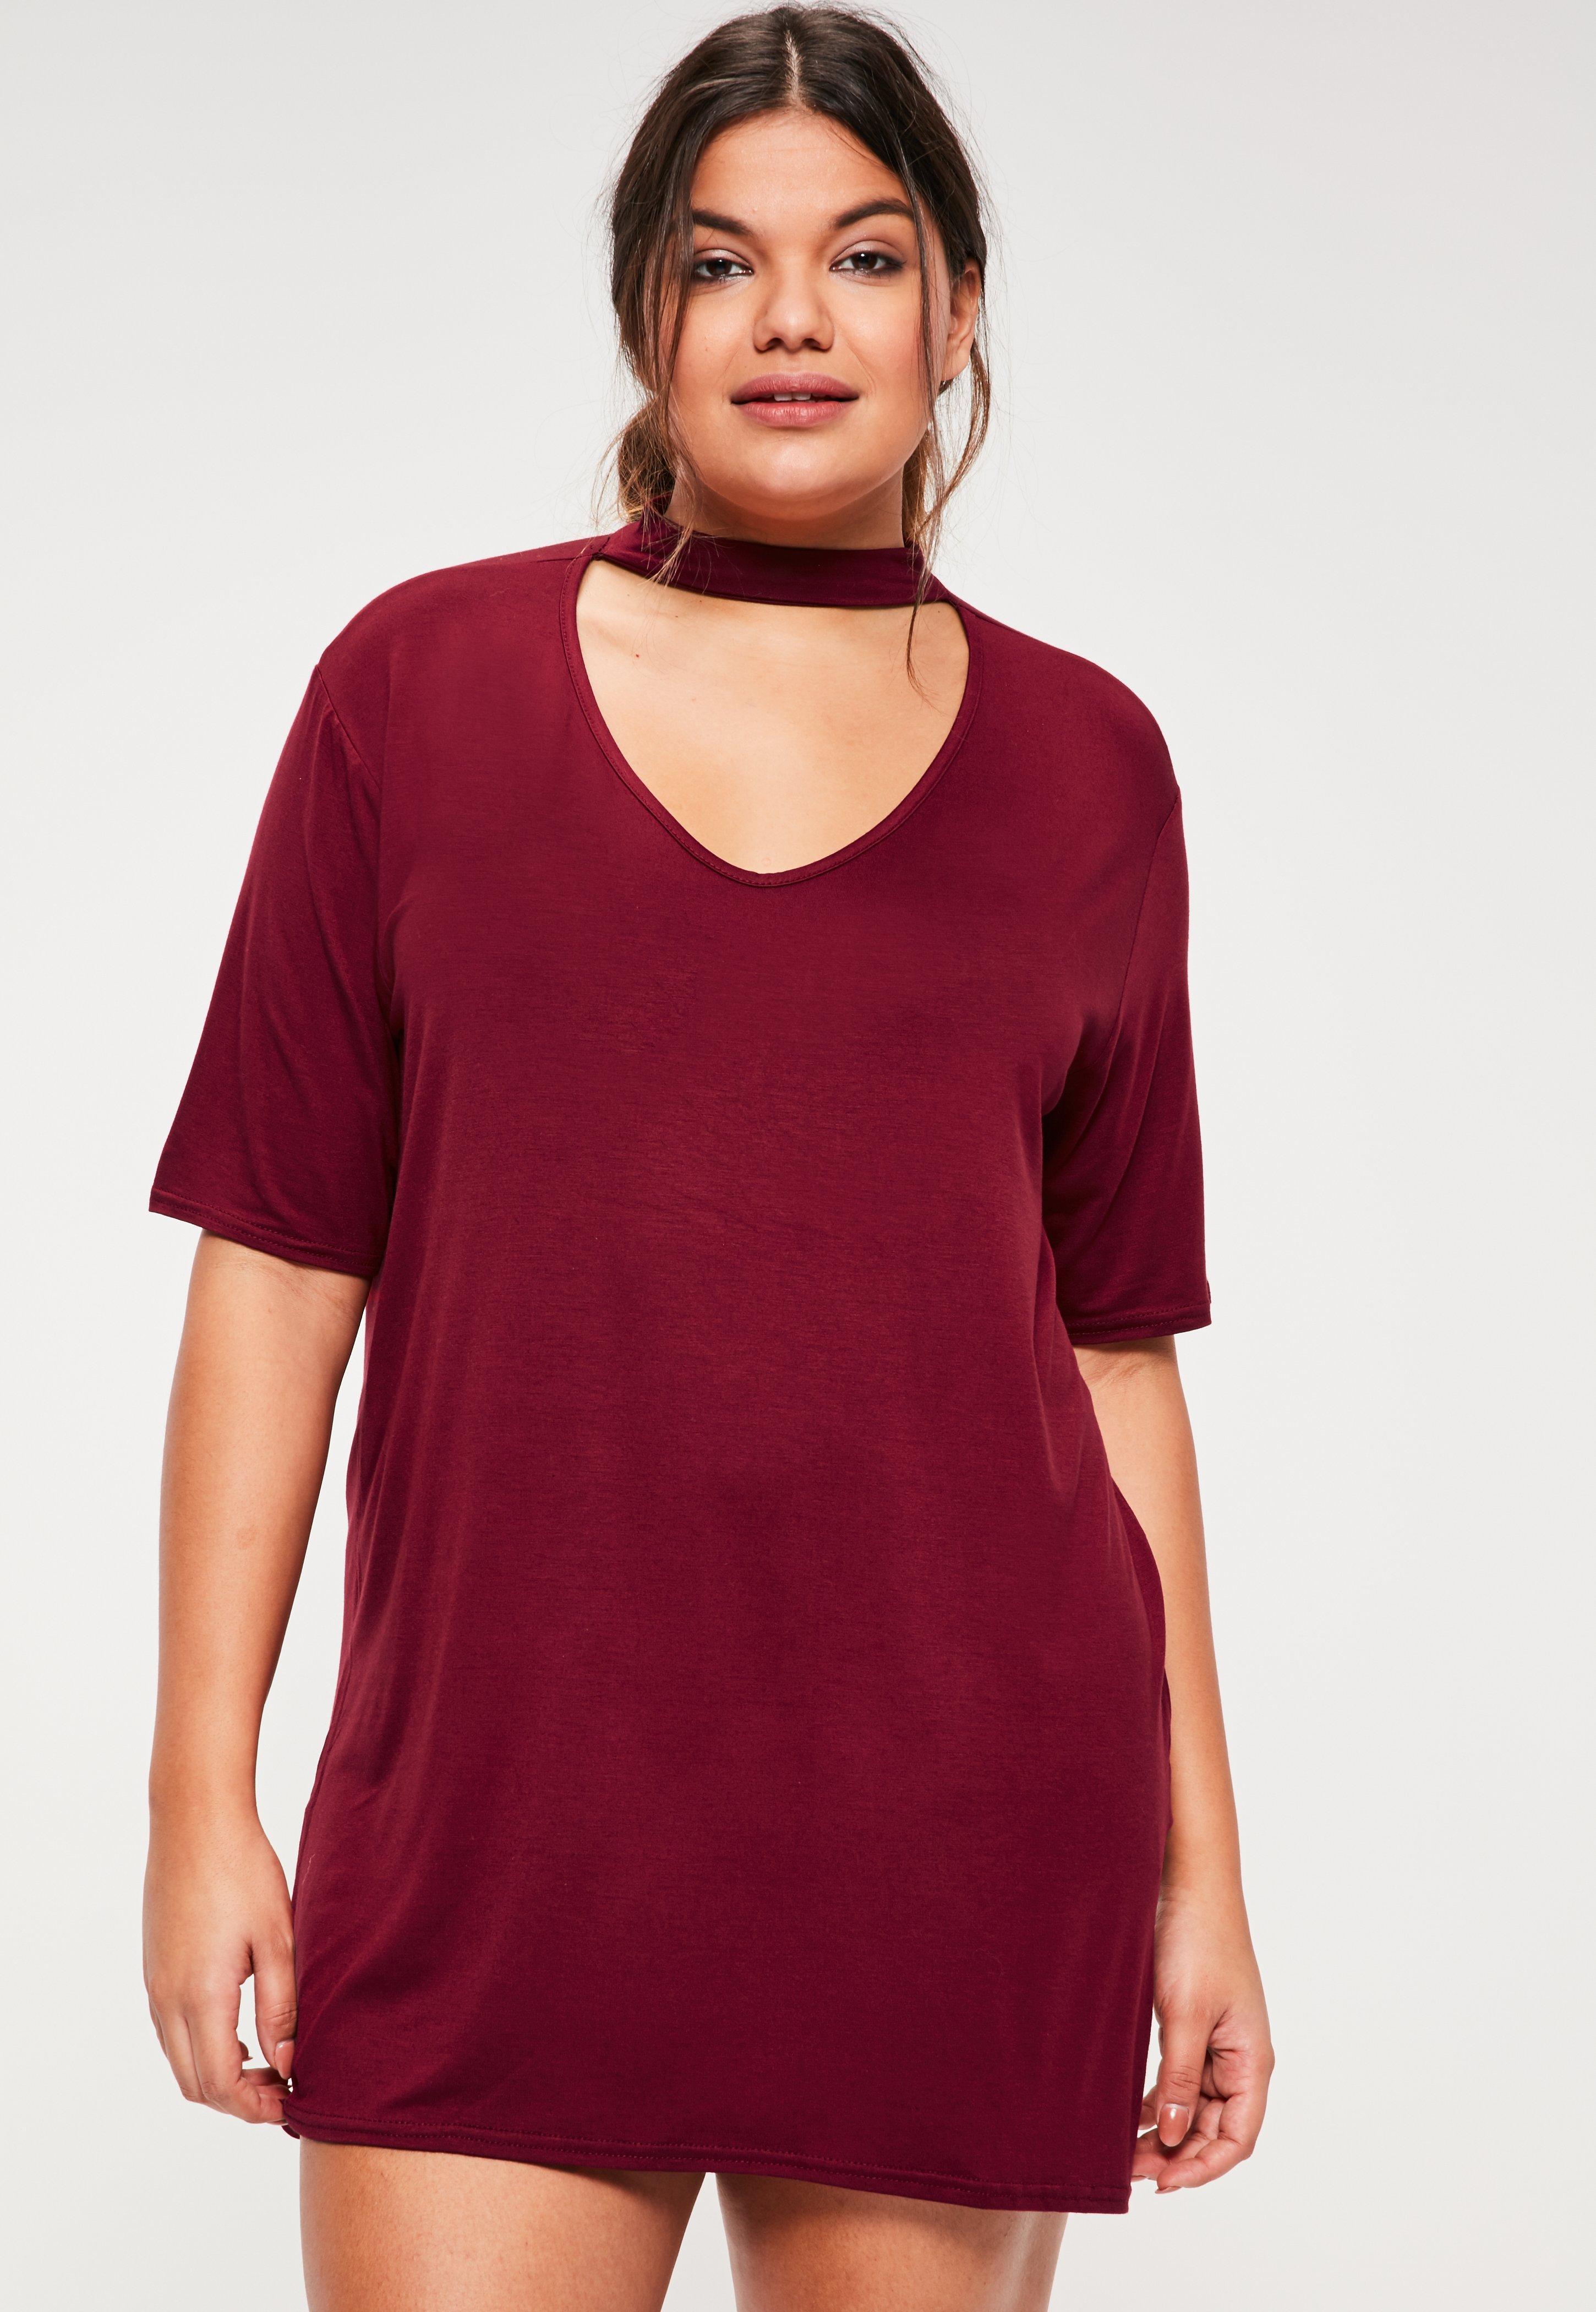 Plus Size Burgundy Choker Neck T-Shirt Dress| Missguided